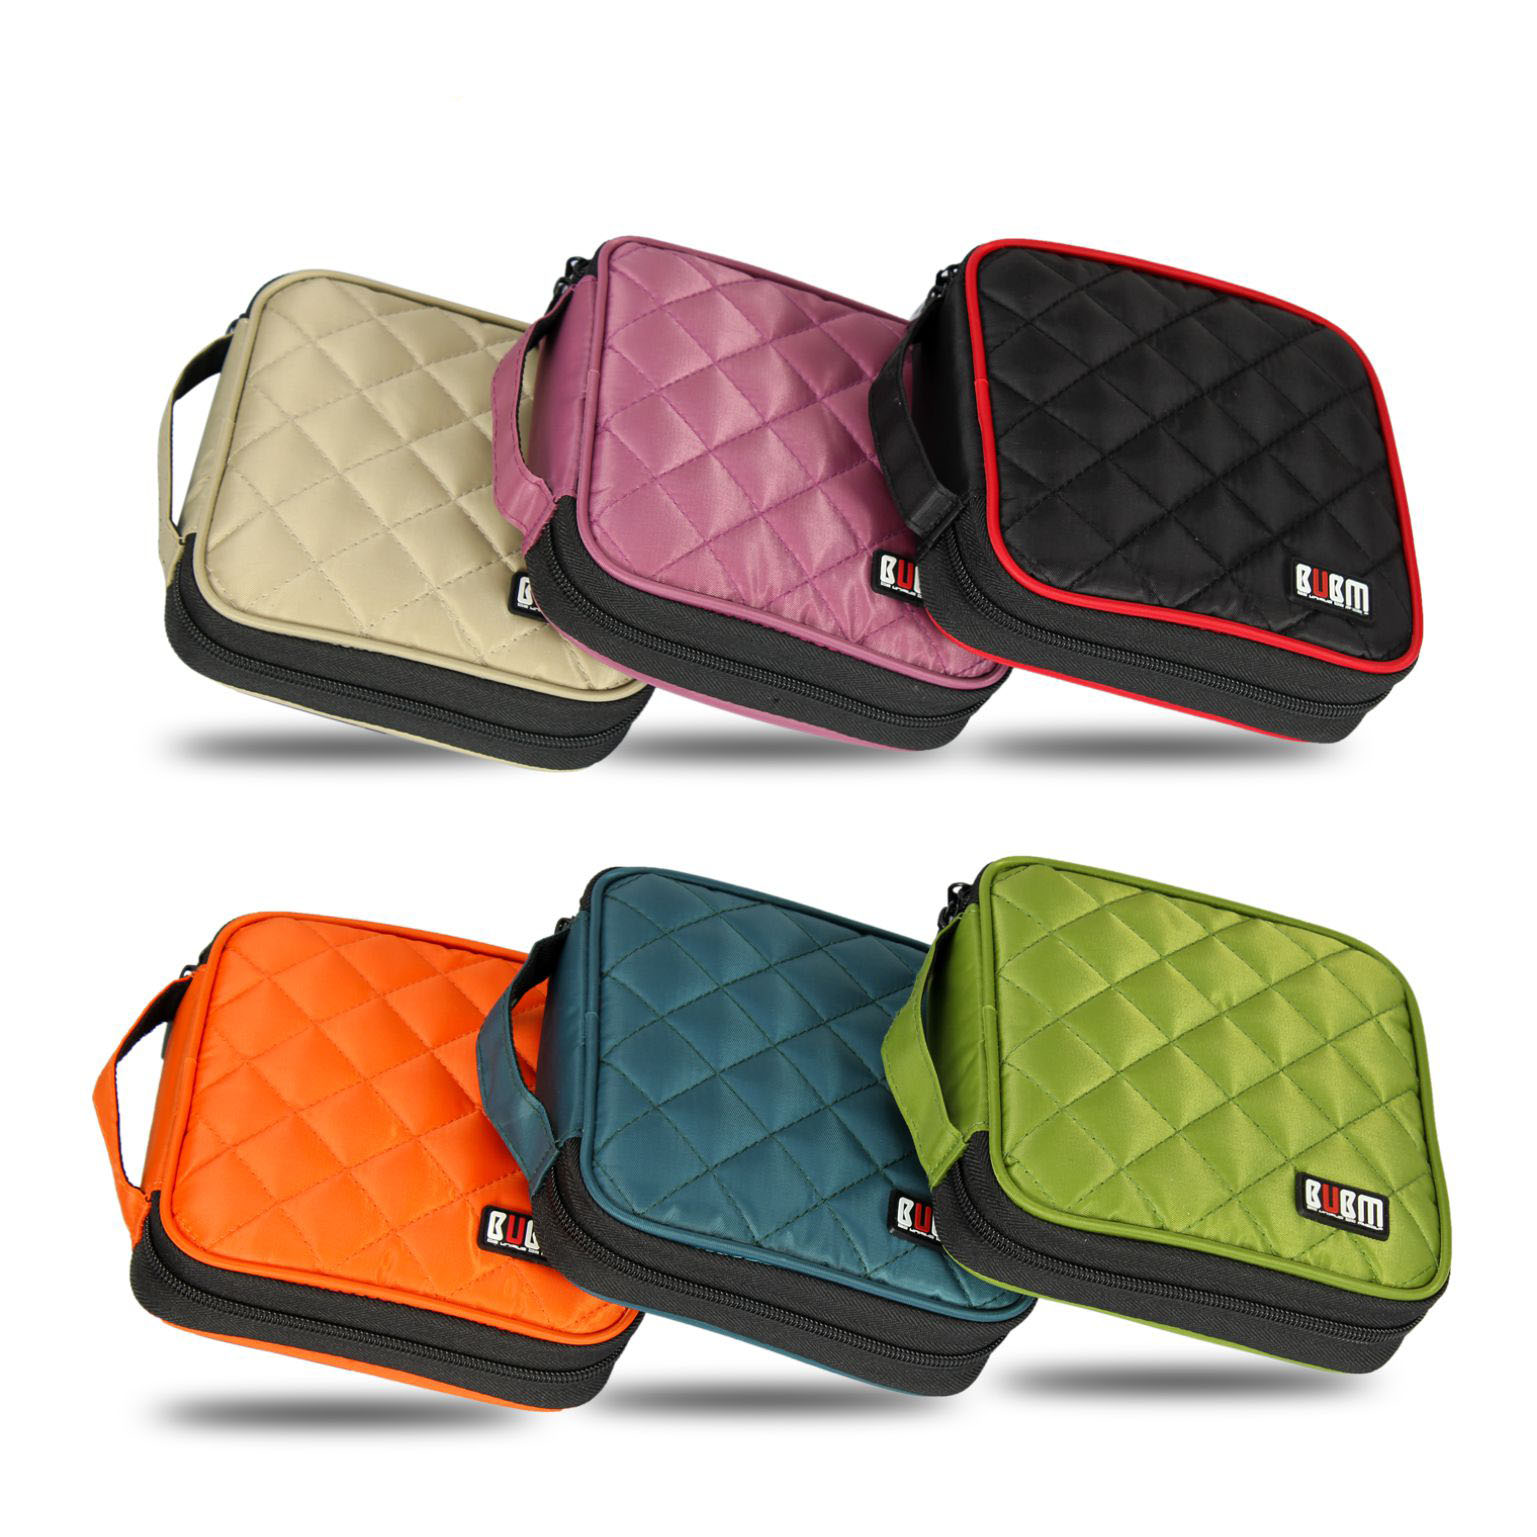 BUBM Fashion Car Auto CD DVD Disk Card Visor Case Holder Clipper Organizer Bag 6 Colors 32 CDs Inside Carry Case(China (Mainland))